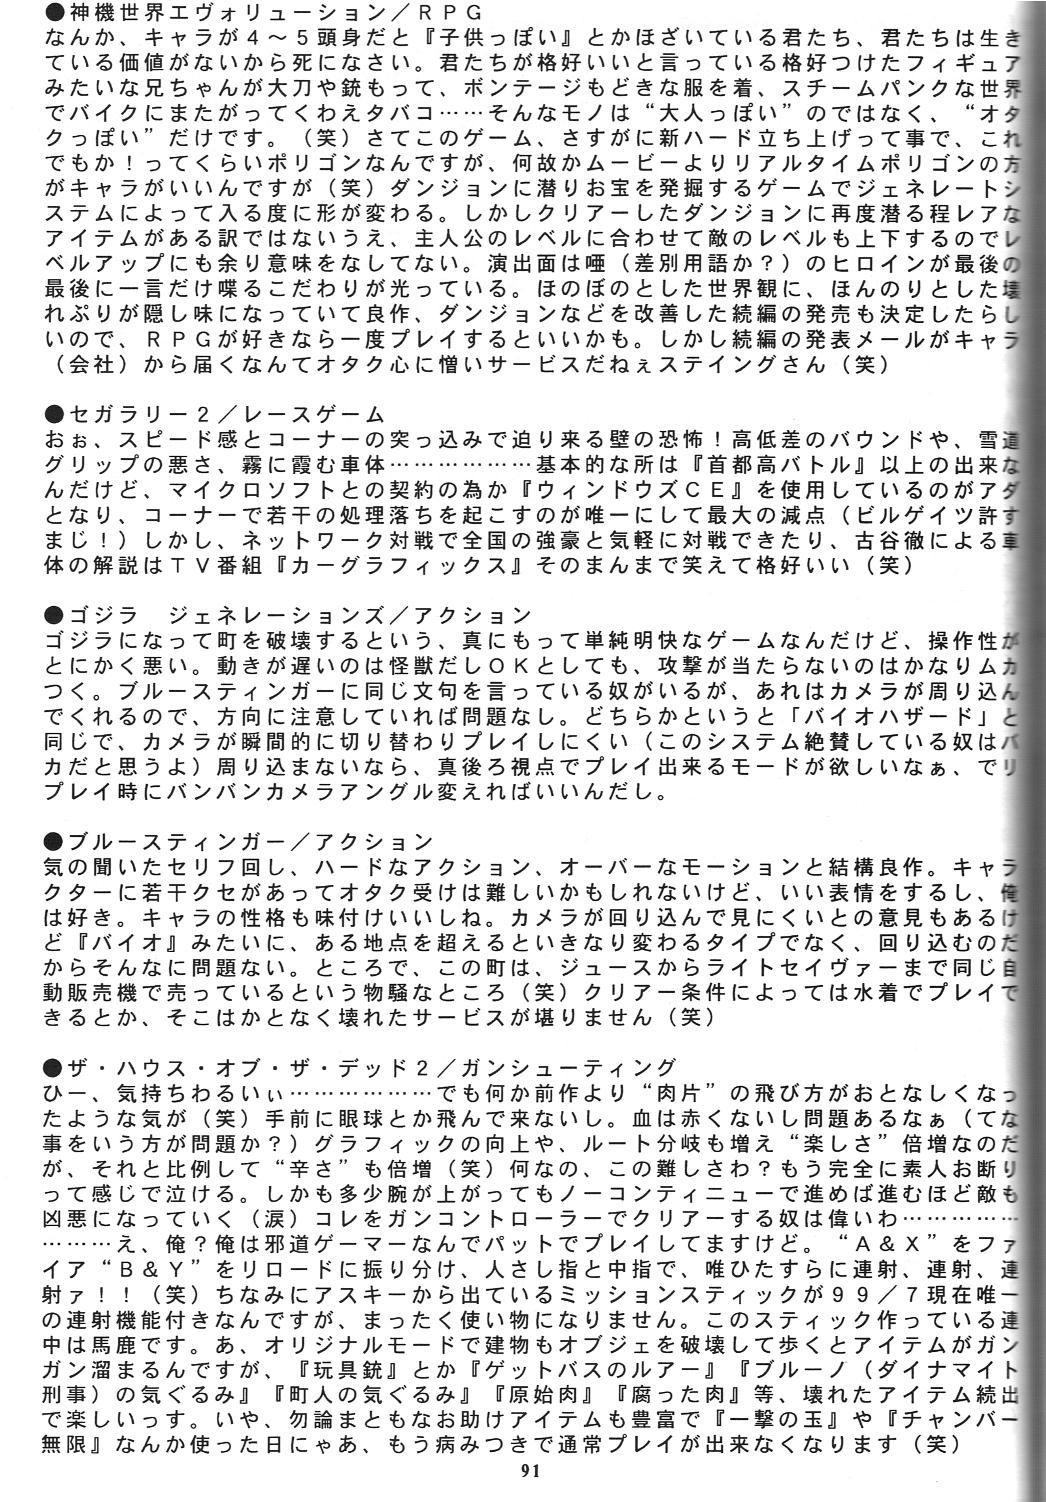 (C56) [Tsurikichi Doumei (Various)] Sengoku Rock - Nan Demo-R (Various) 91